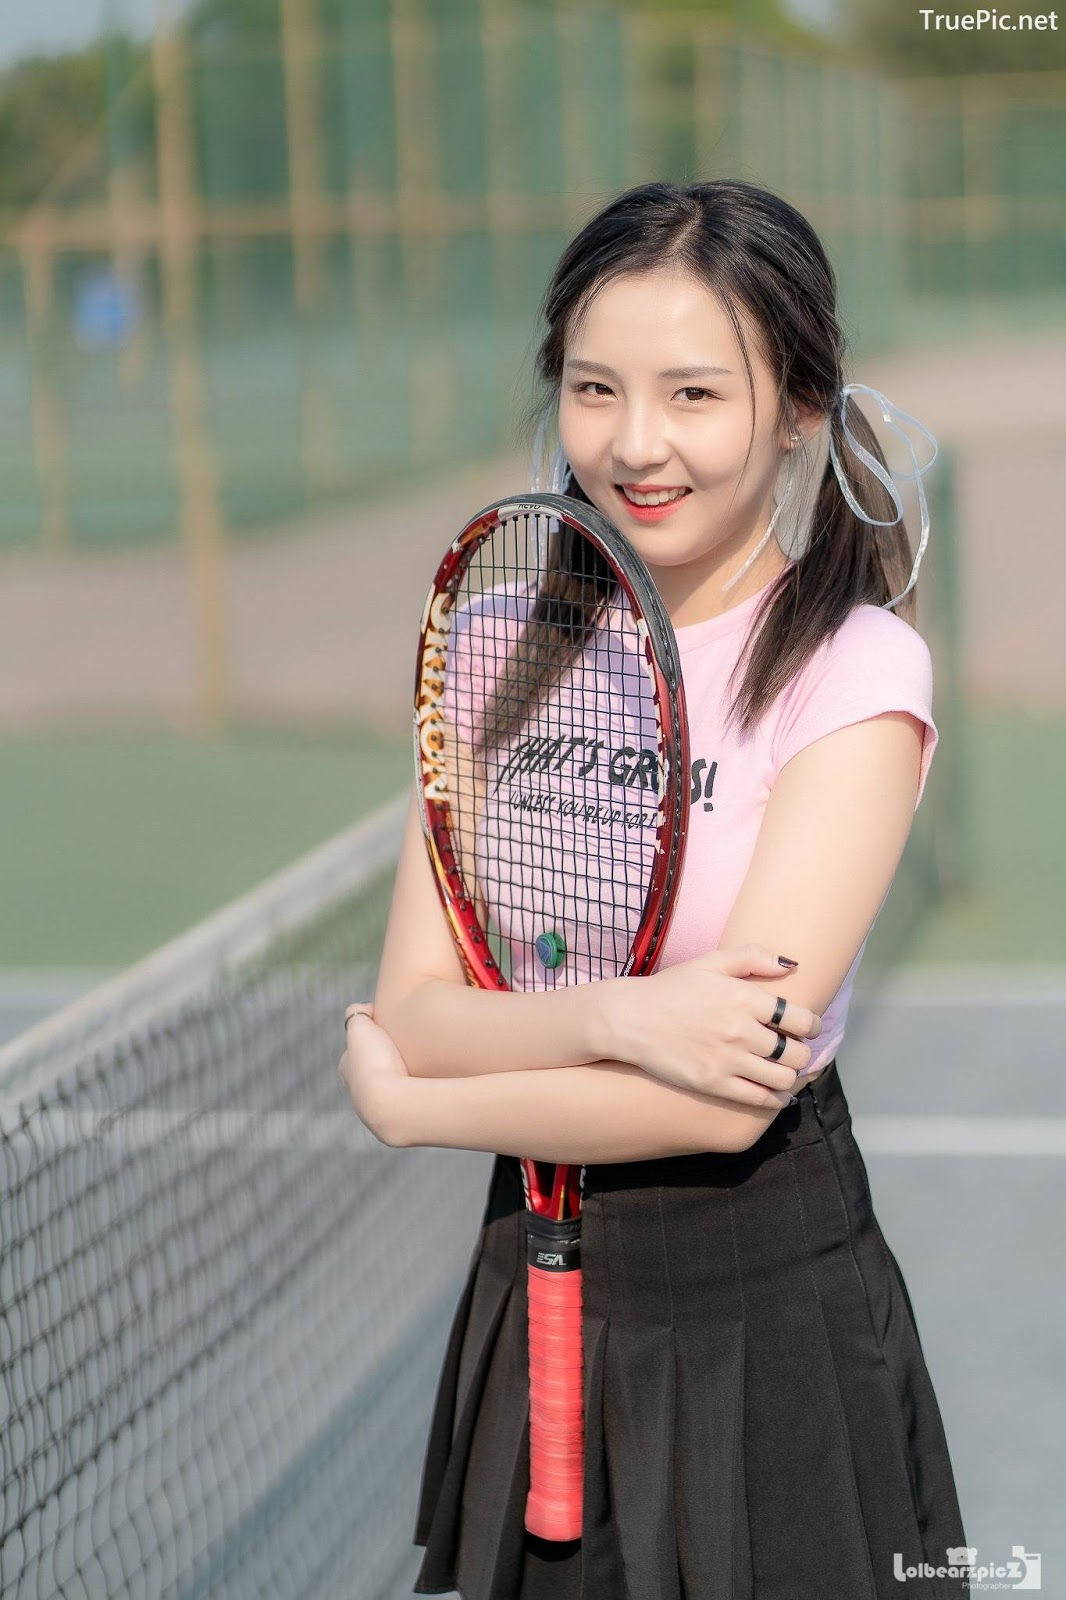 Image Thailand Model - Pattanan Truengjitrarat - Cute Sports Girl - TruePic.net - Picture-9